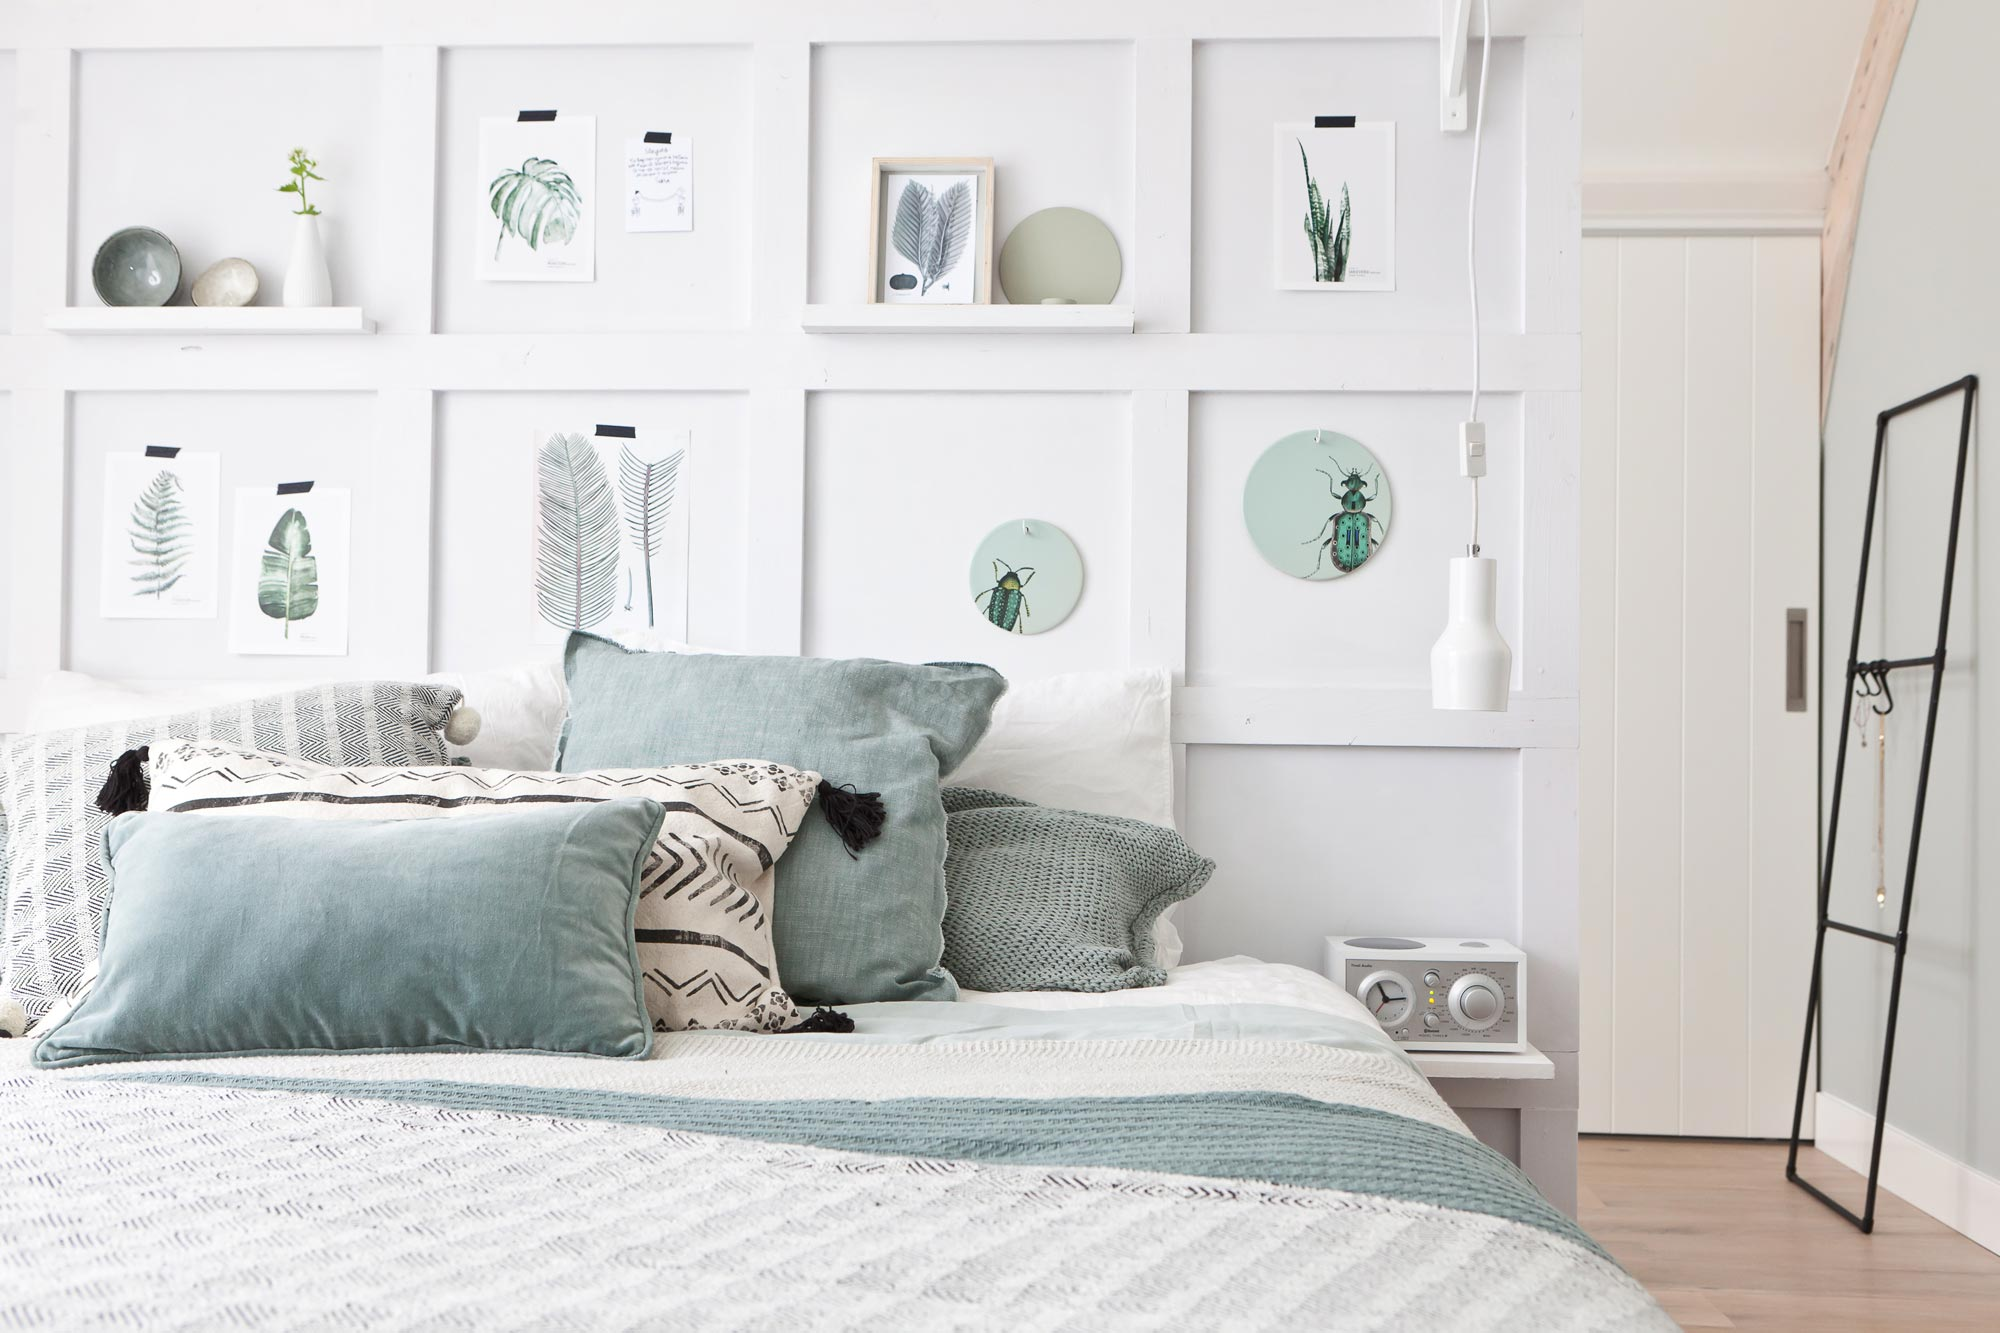 chambre decoration minimaliste sobre kinfolk